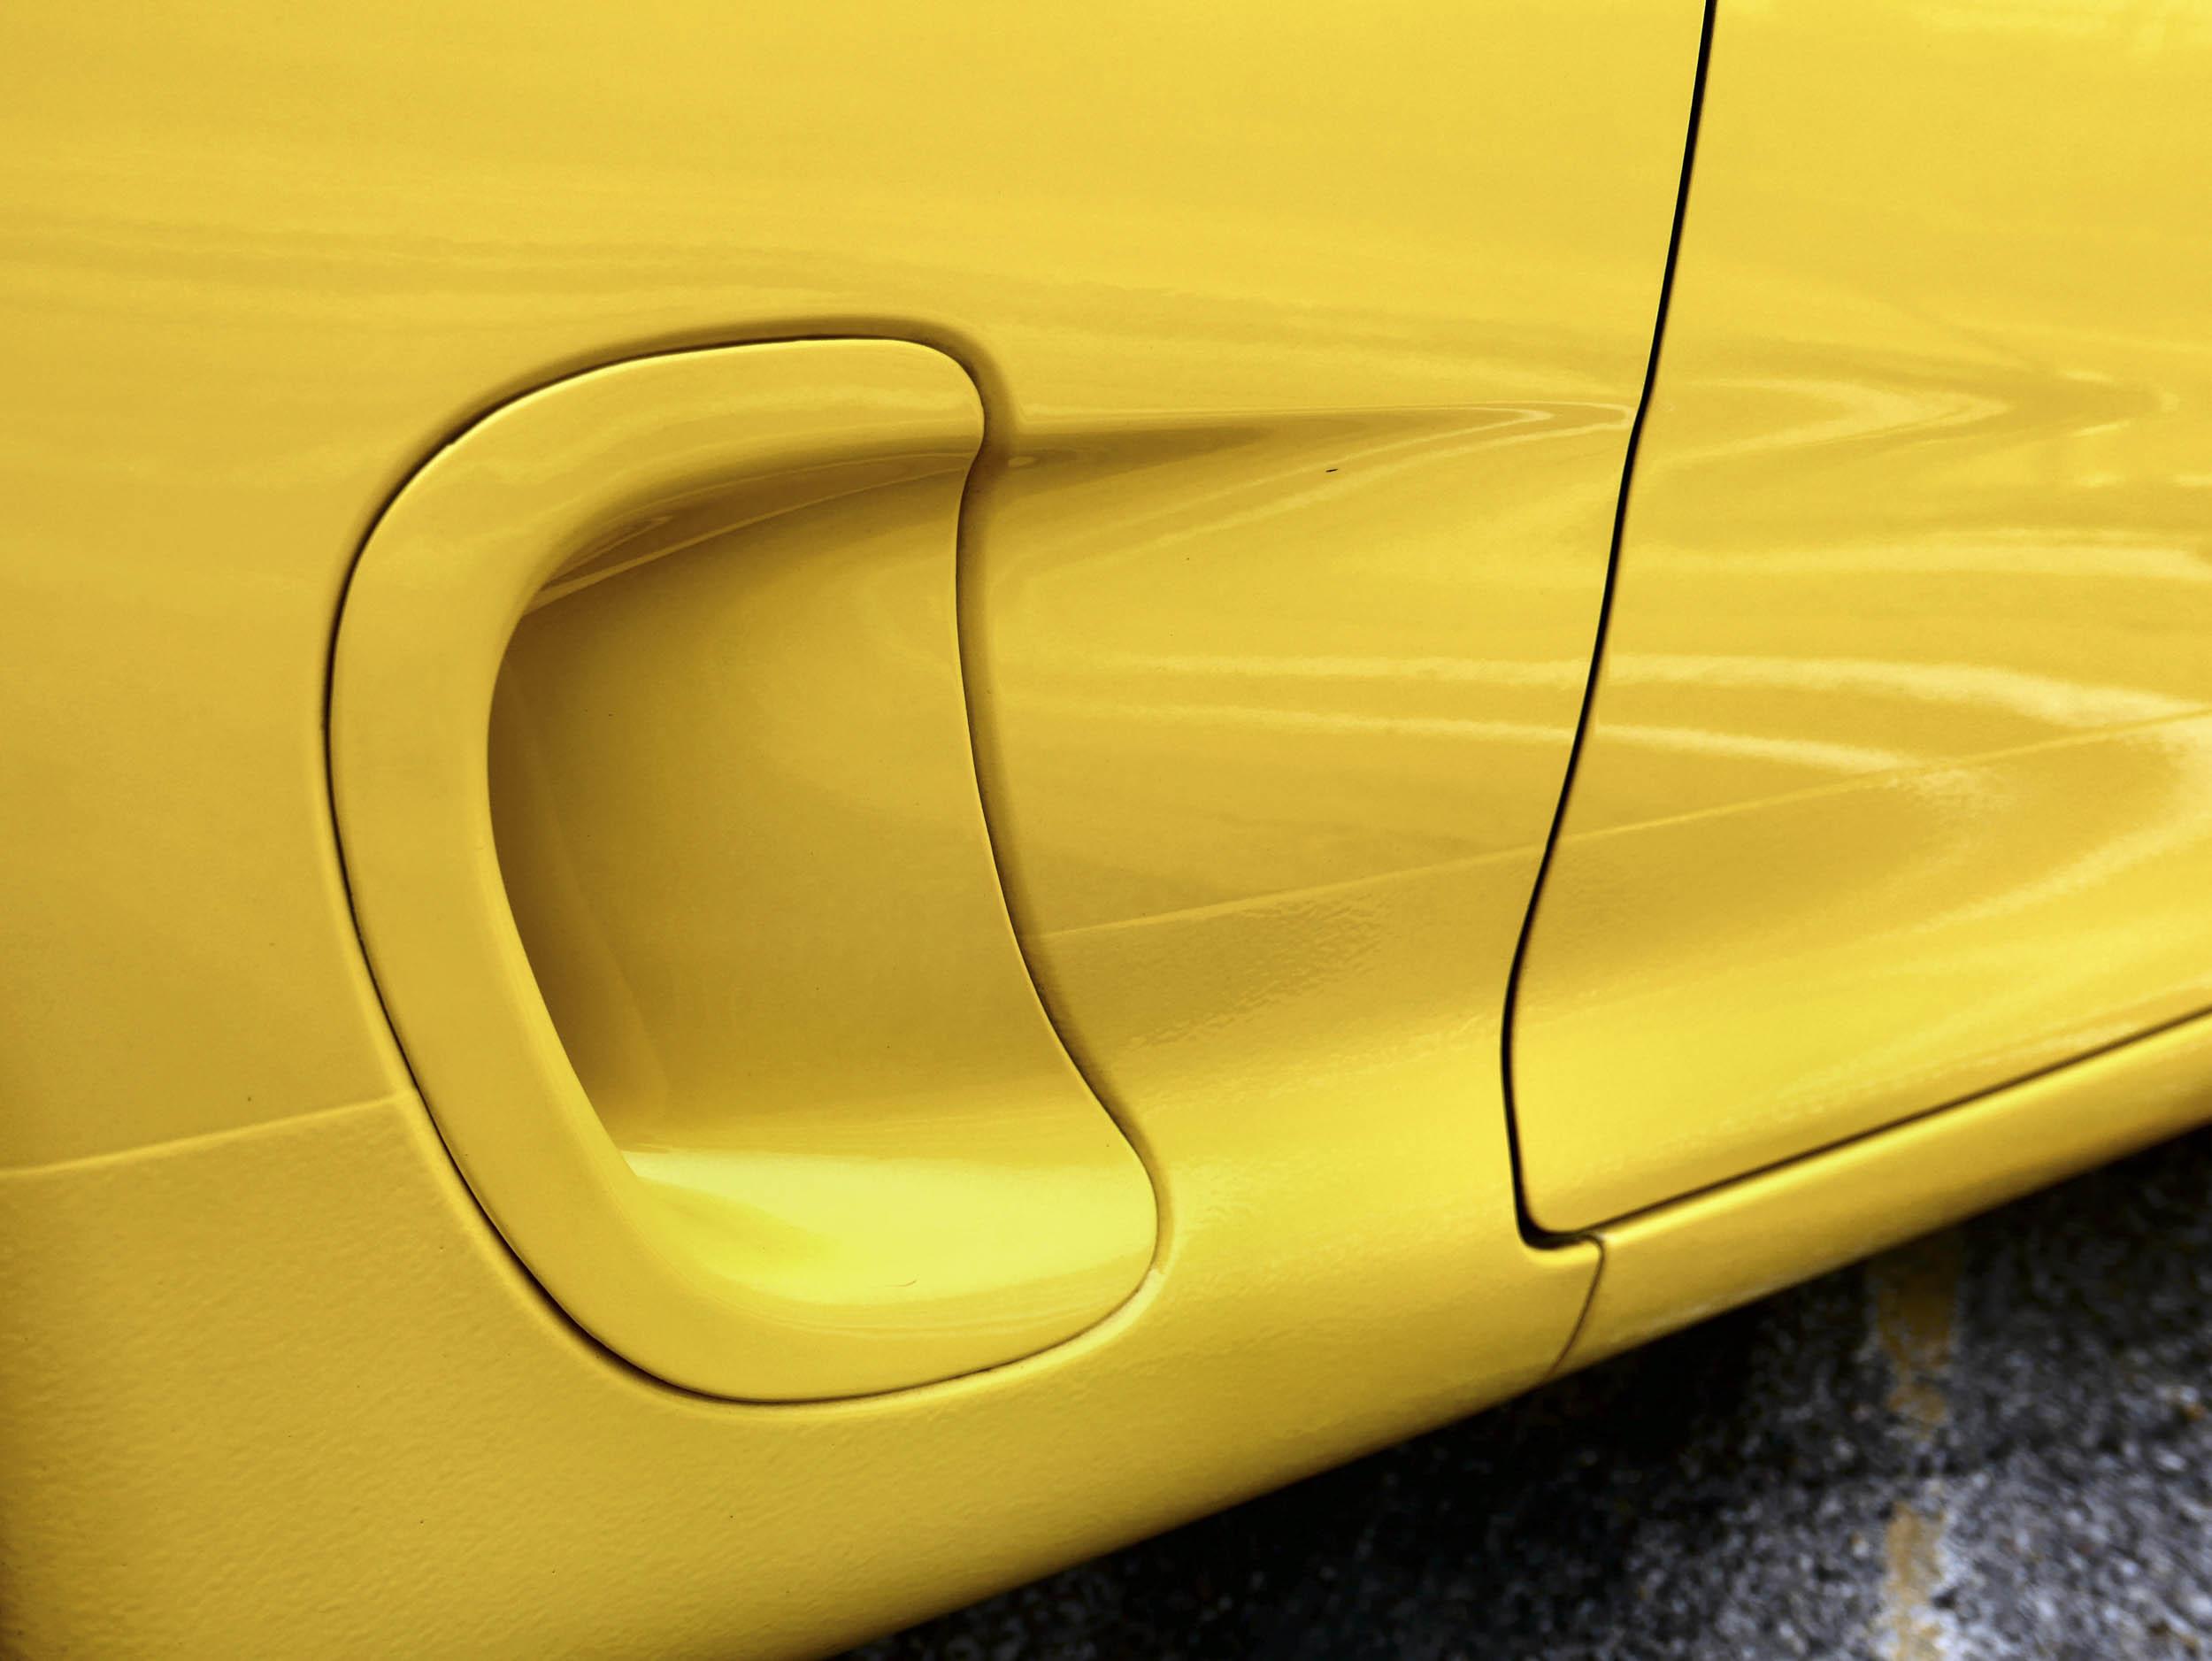 Mazda RX-7 side vent detail